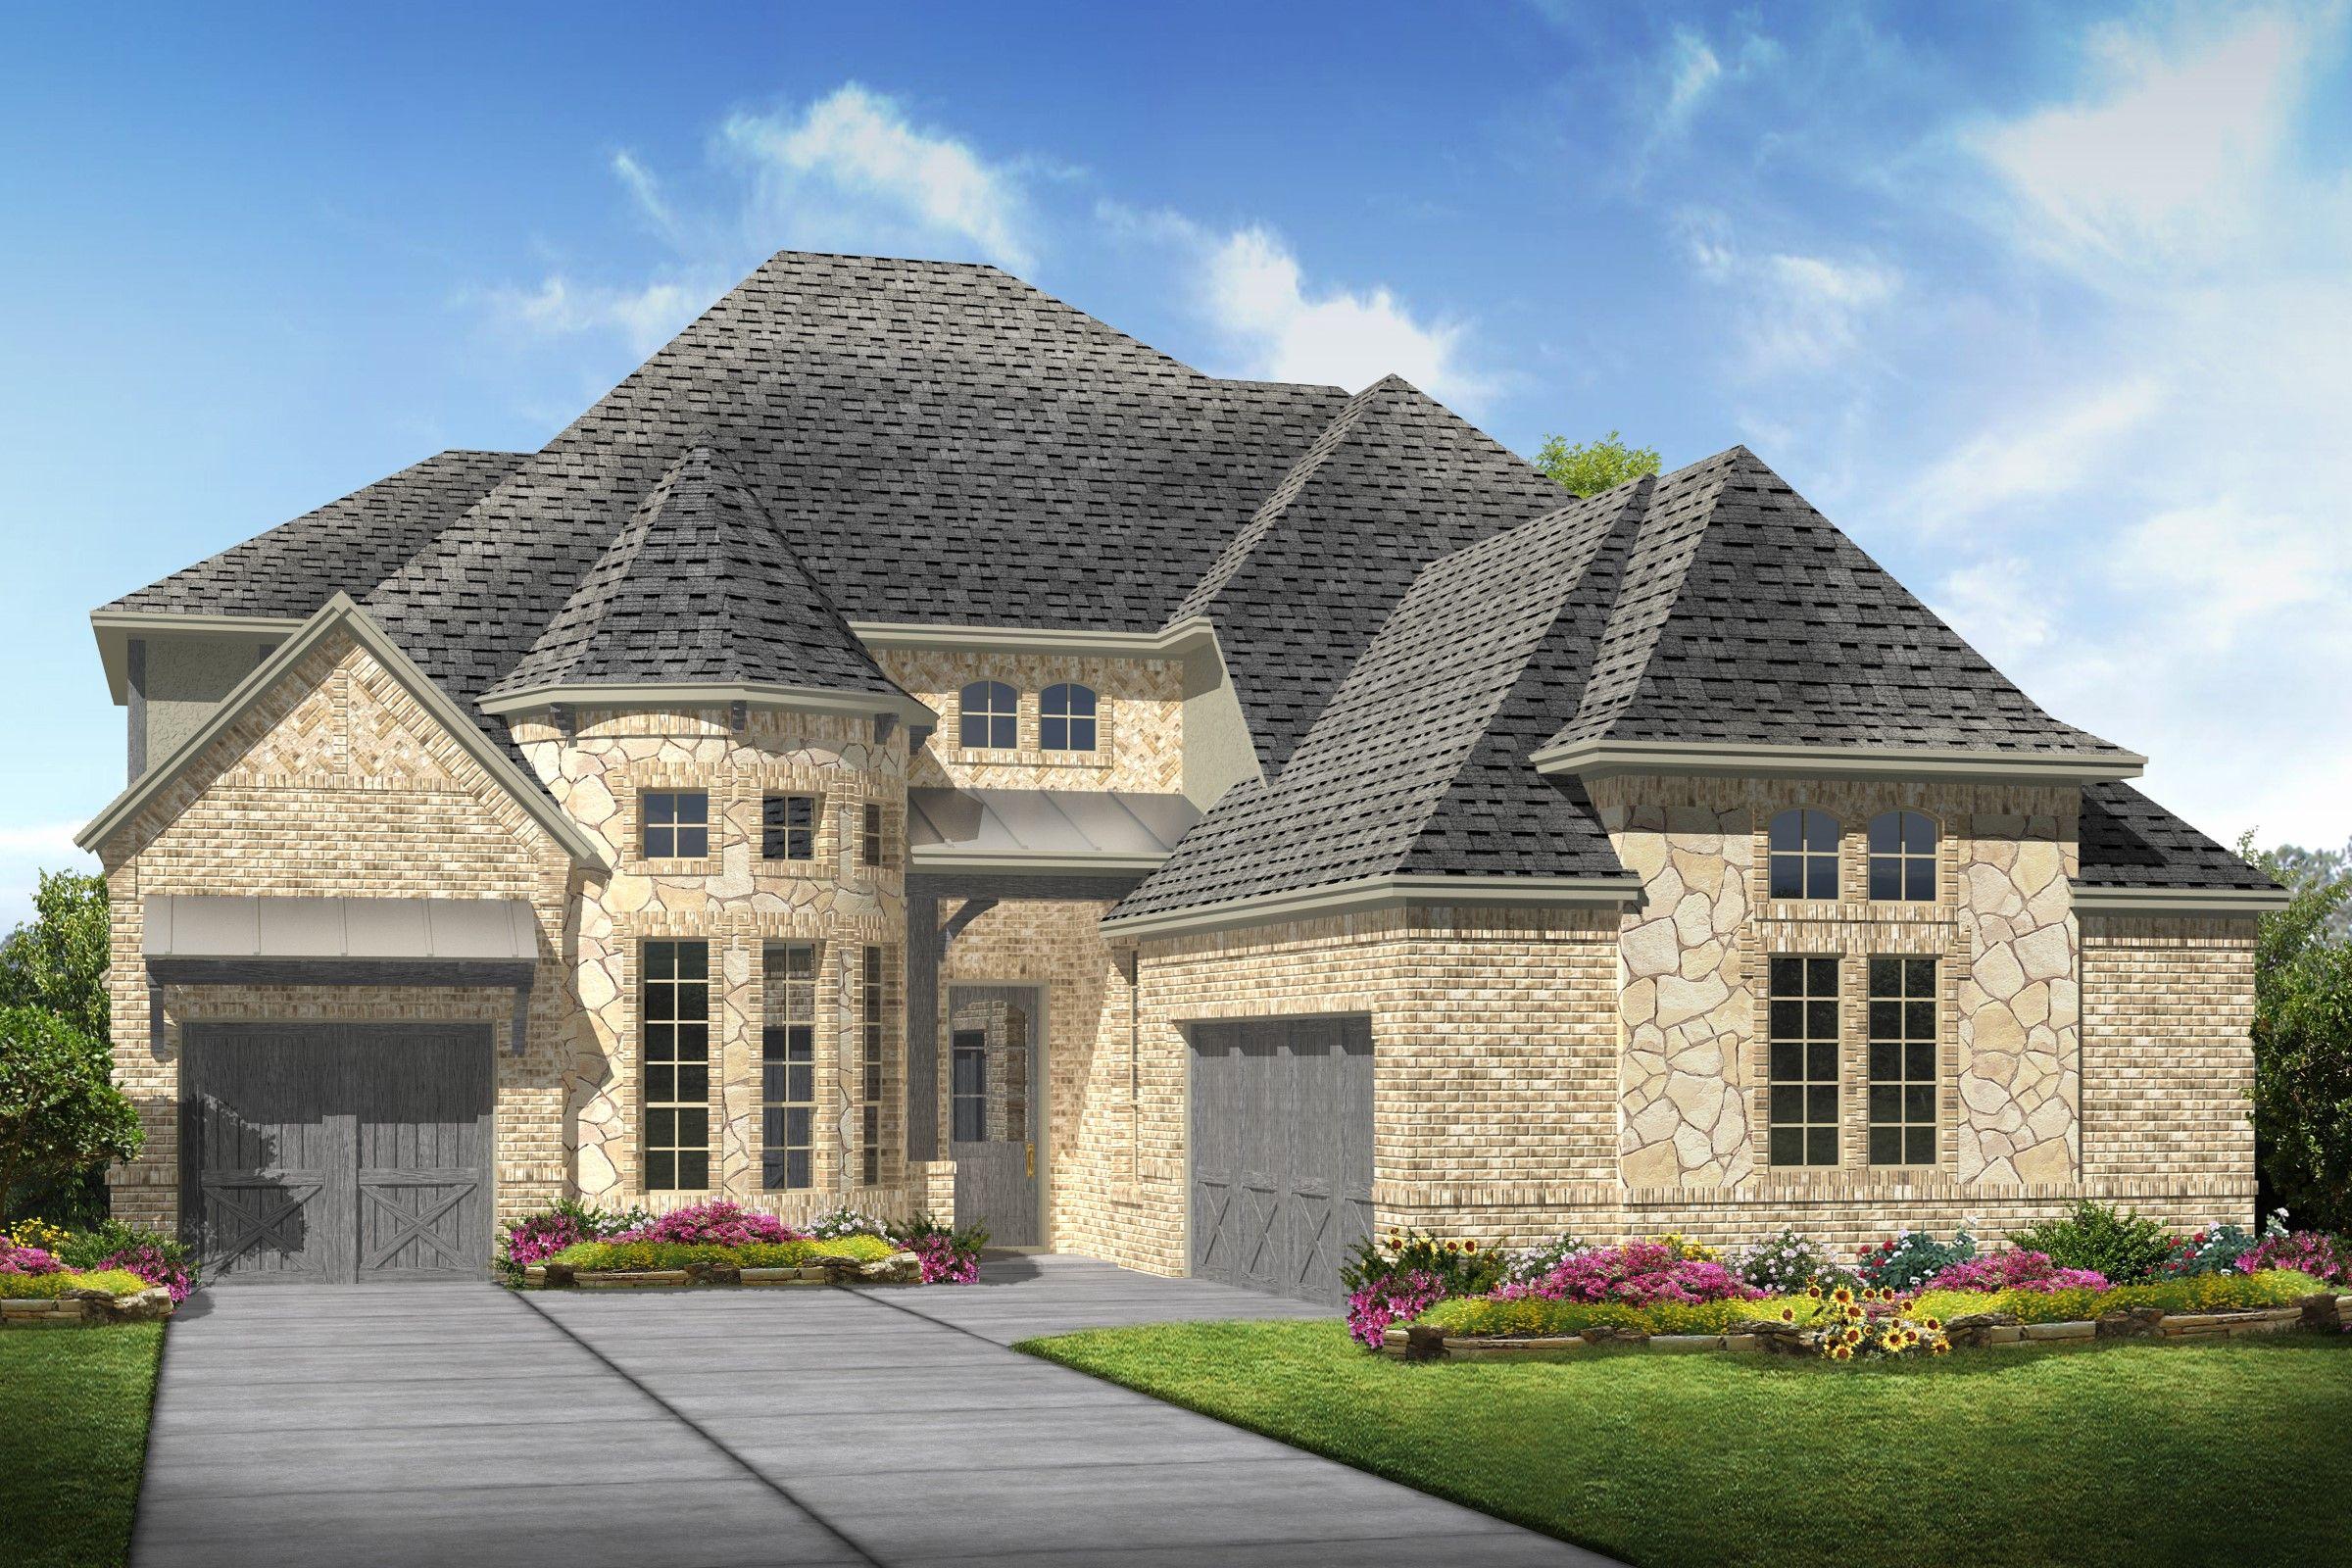 Single Family for Sale at Alden Ii 1028 Prairie Ridge Lane, Homesite 57-14 Fort Worth, Texas 76115 United States